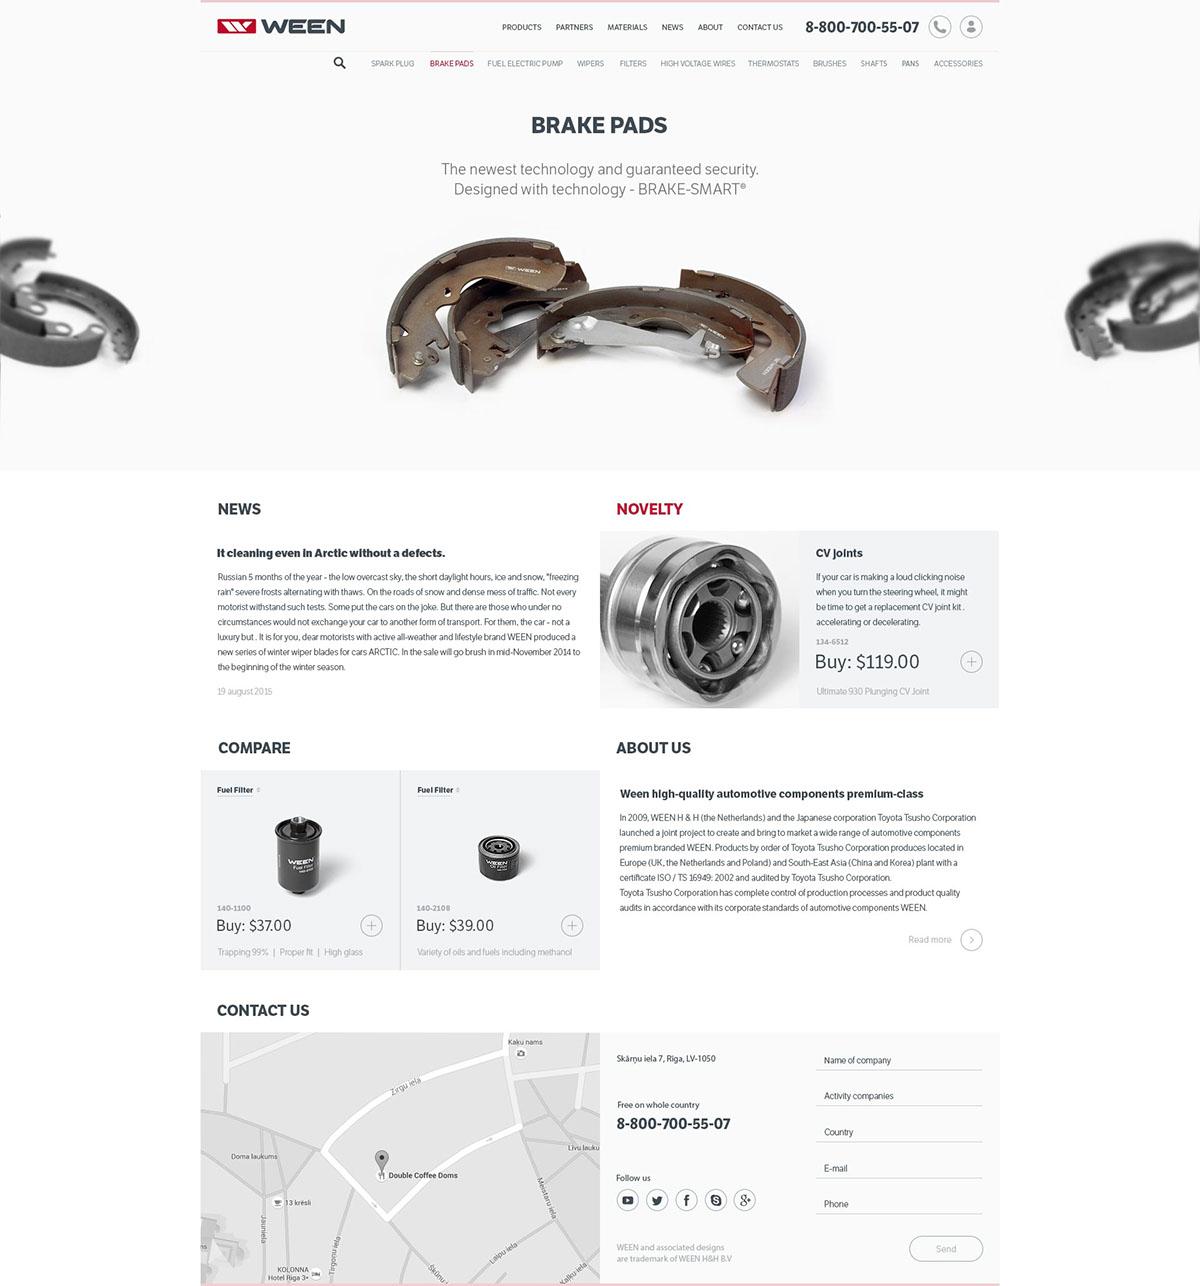 ween equipment tools UI ux Web design photo spark